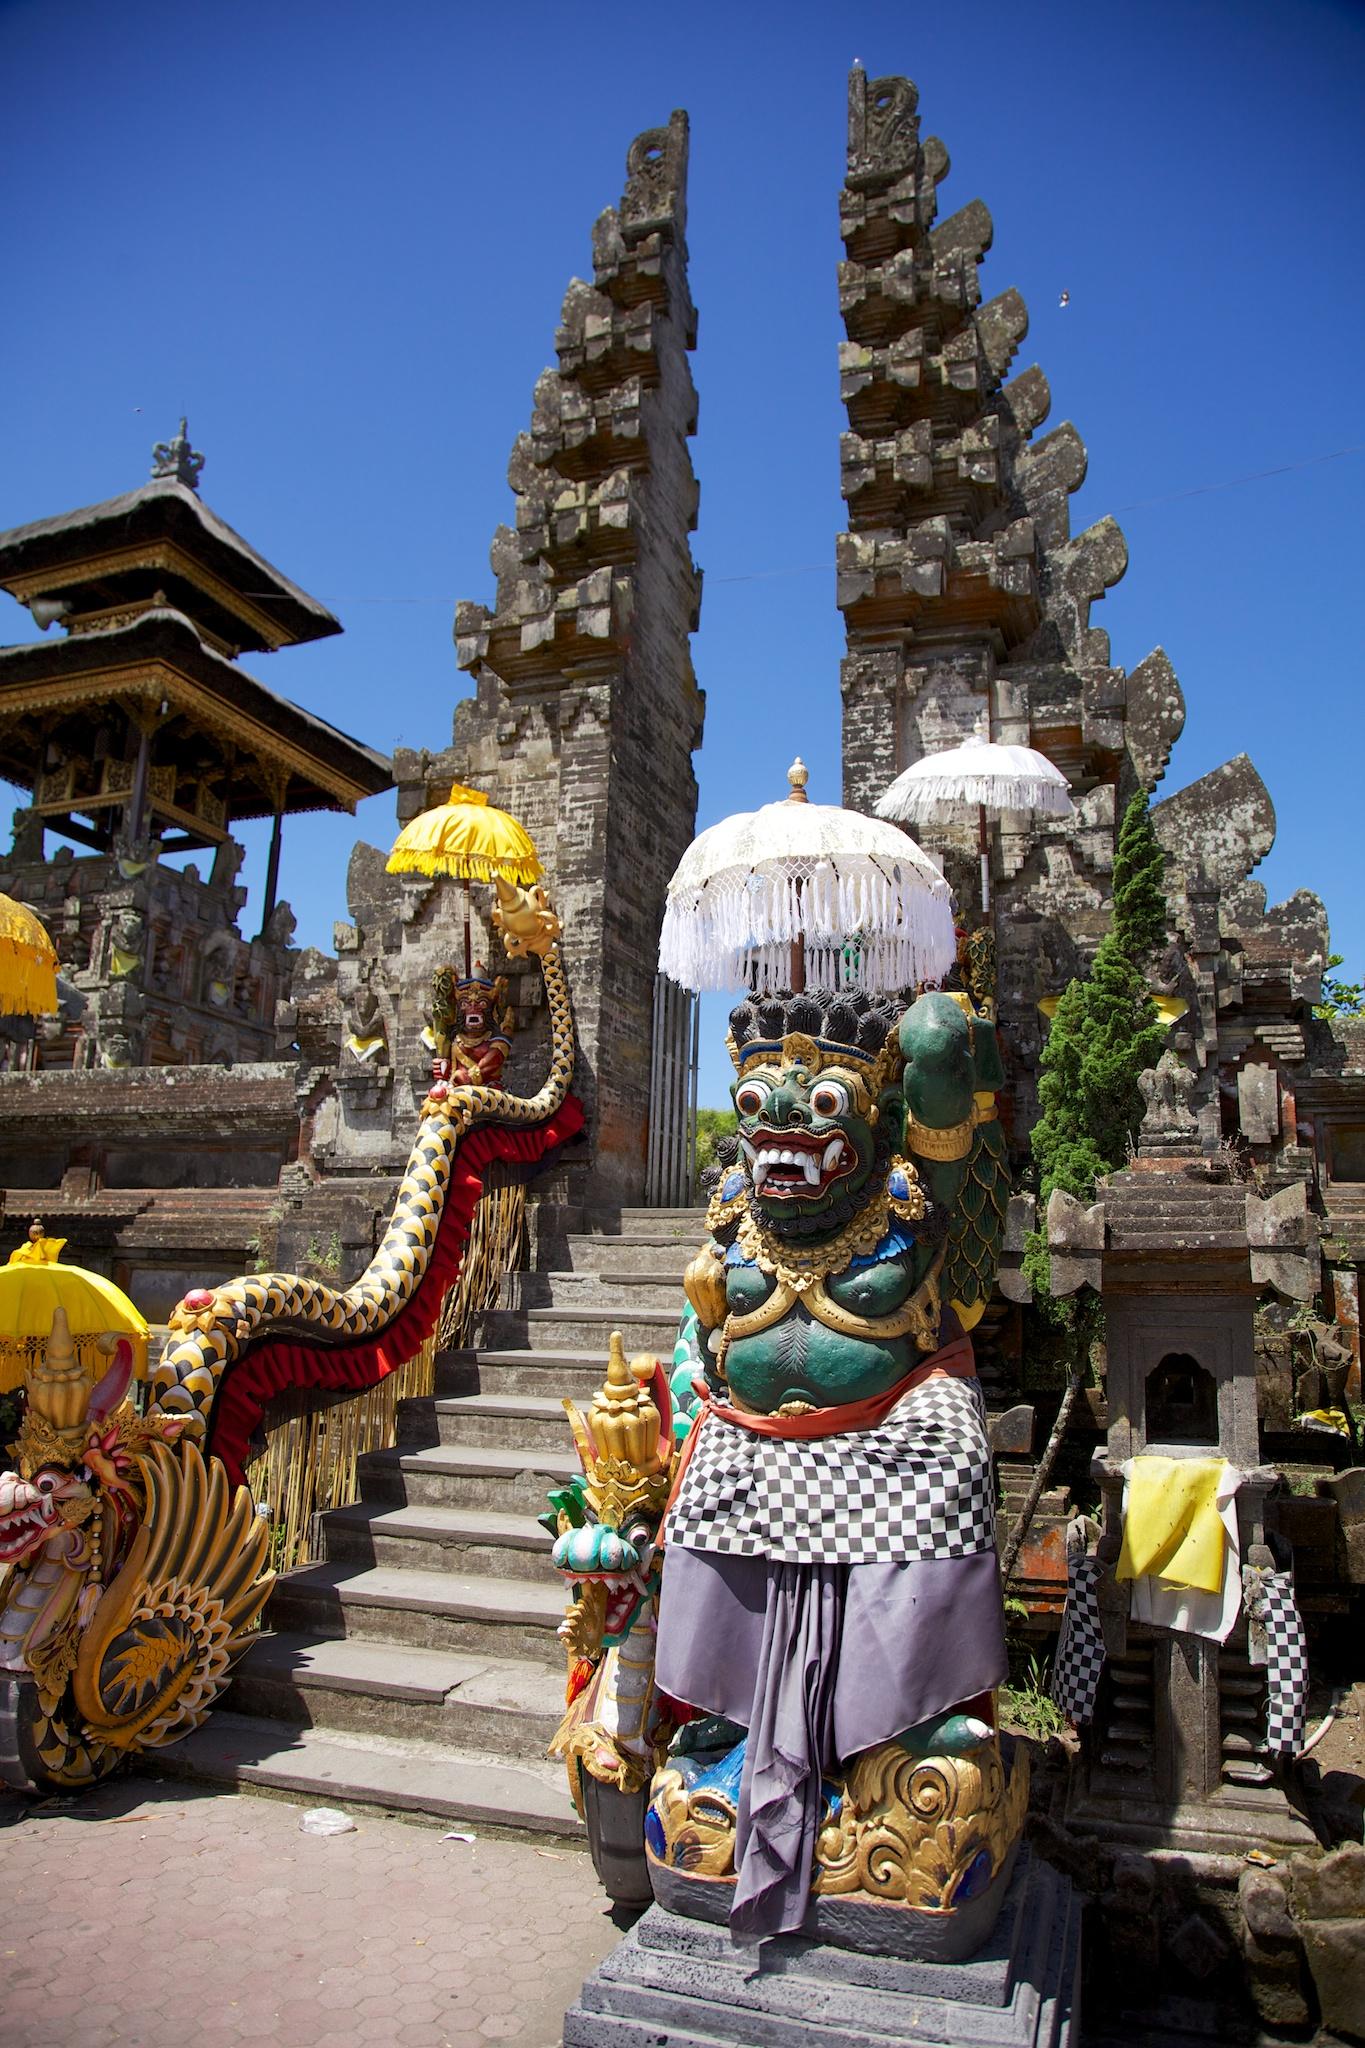 One of the entrances to Pura Ulundanu Batur.